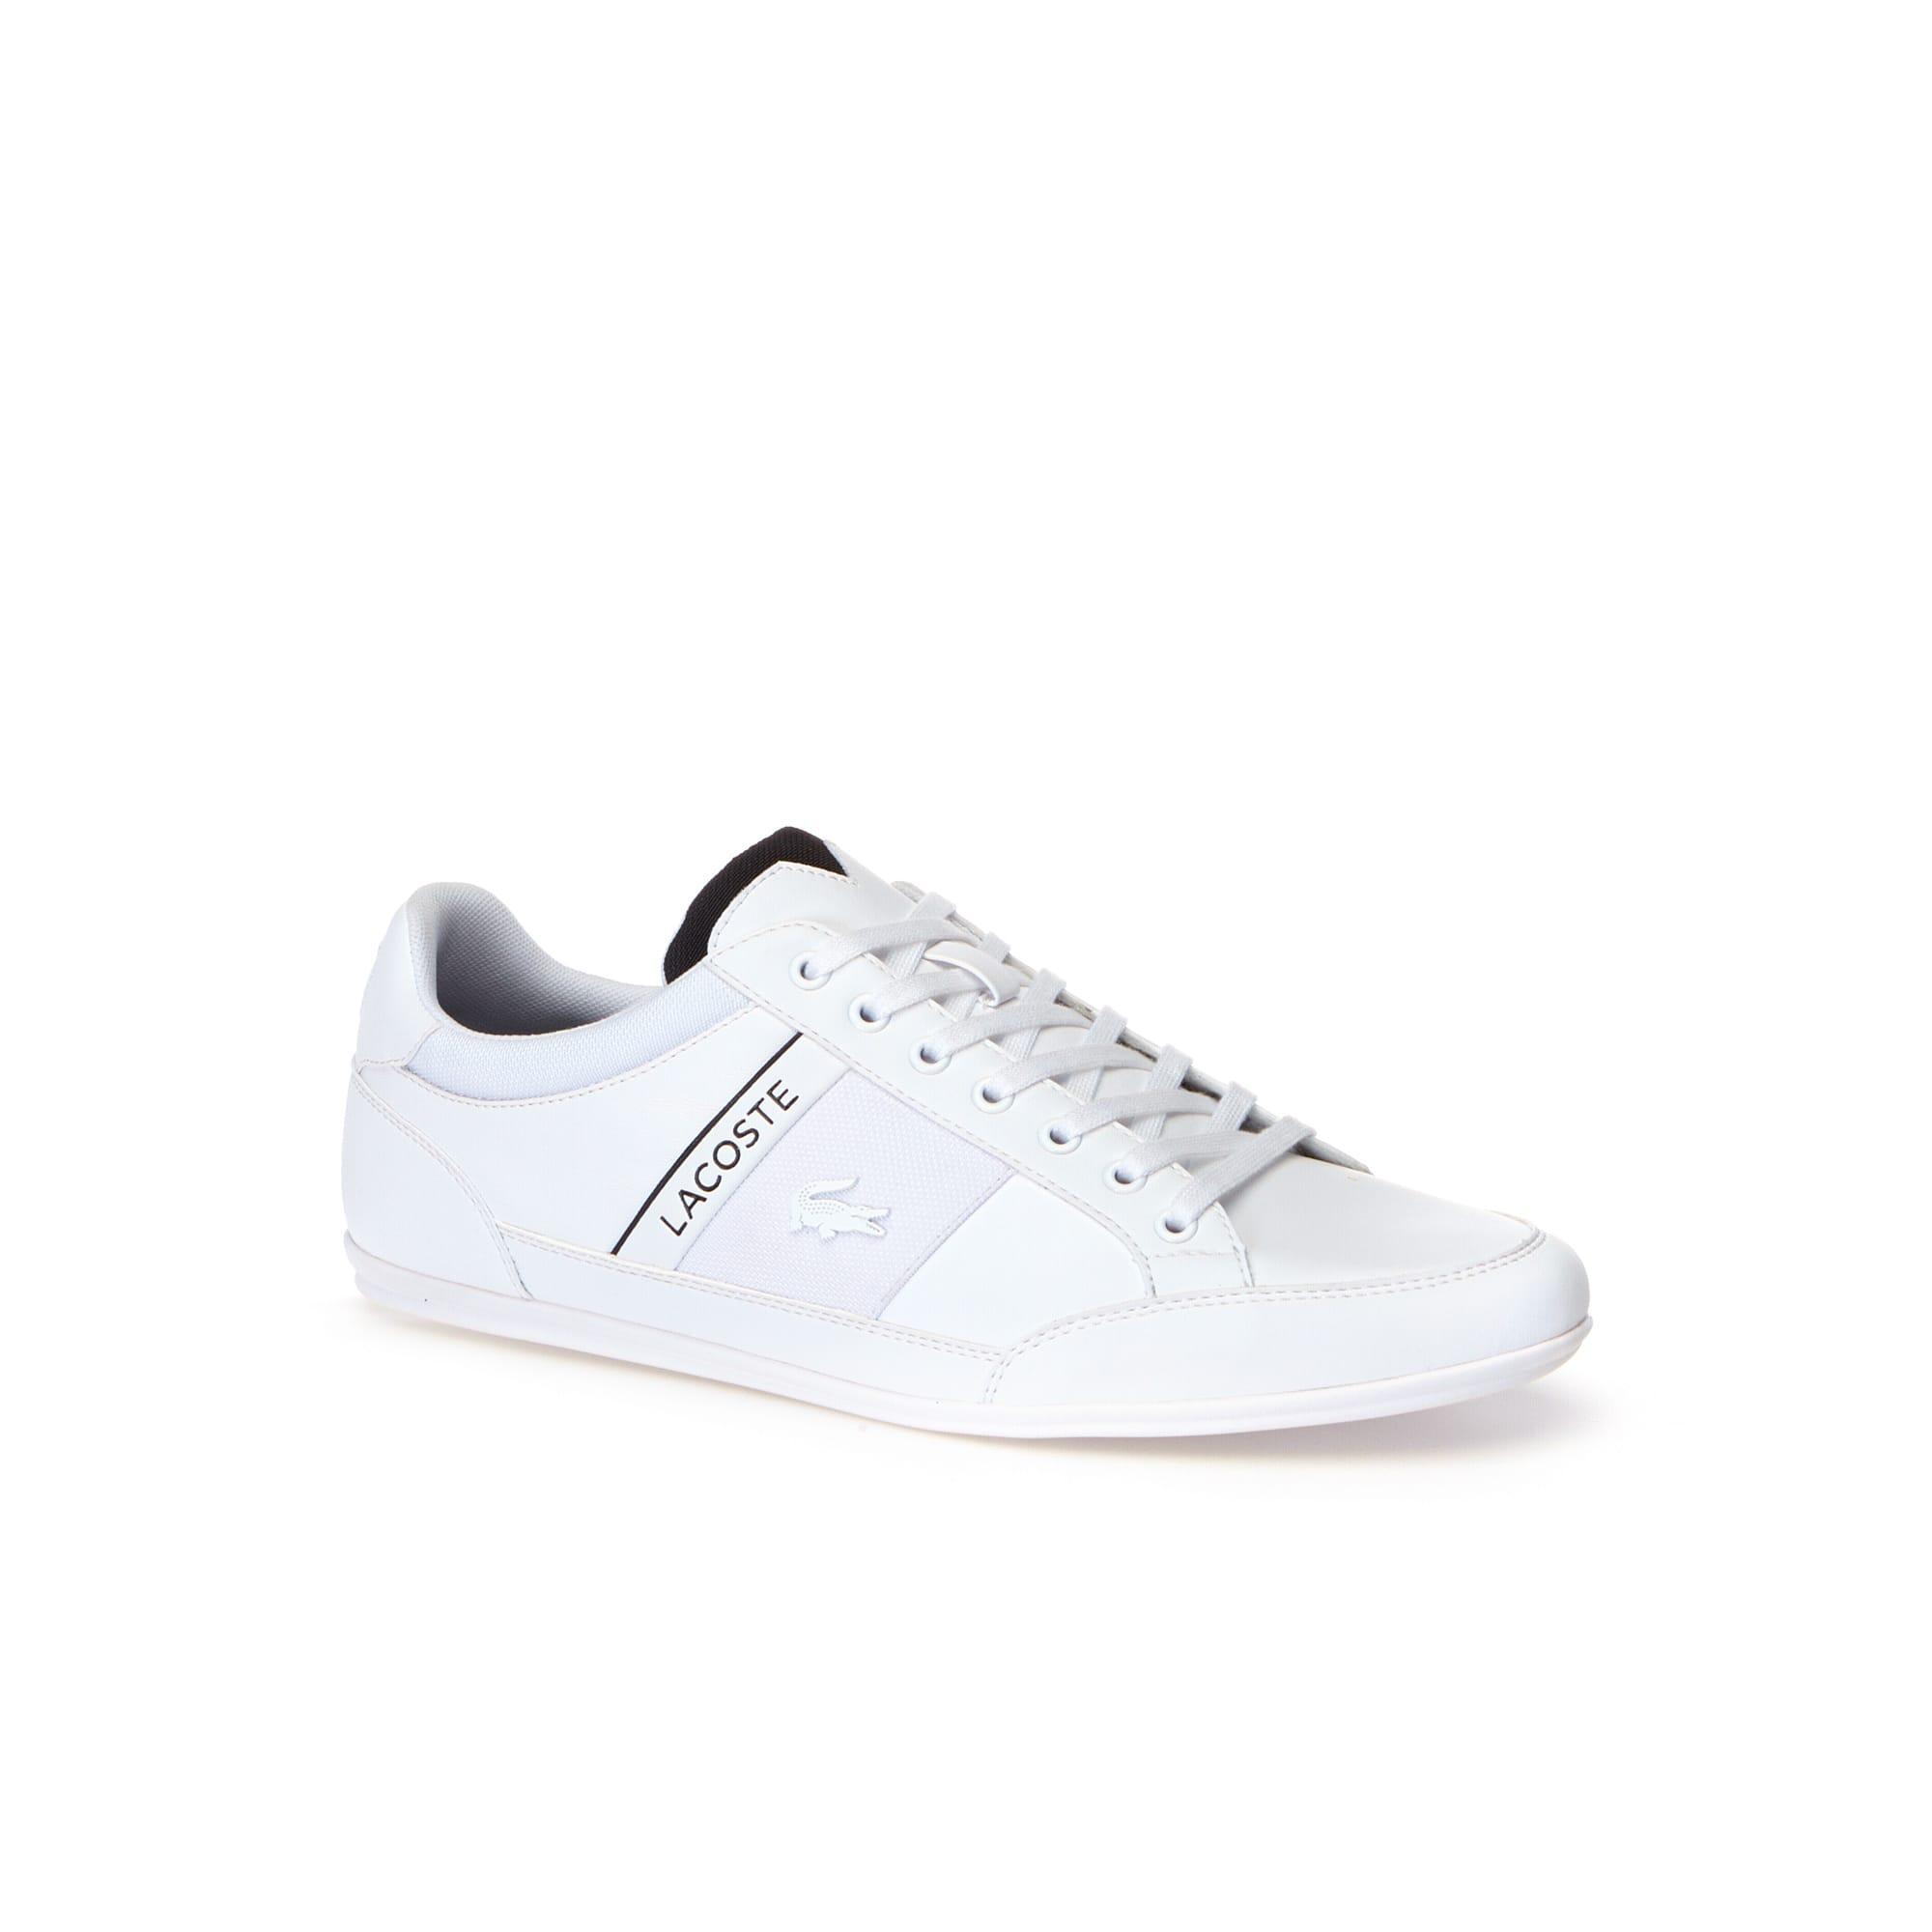 Sneakers Chaymon homme en cuir nappa